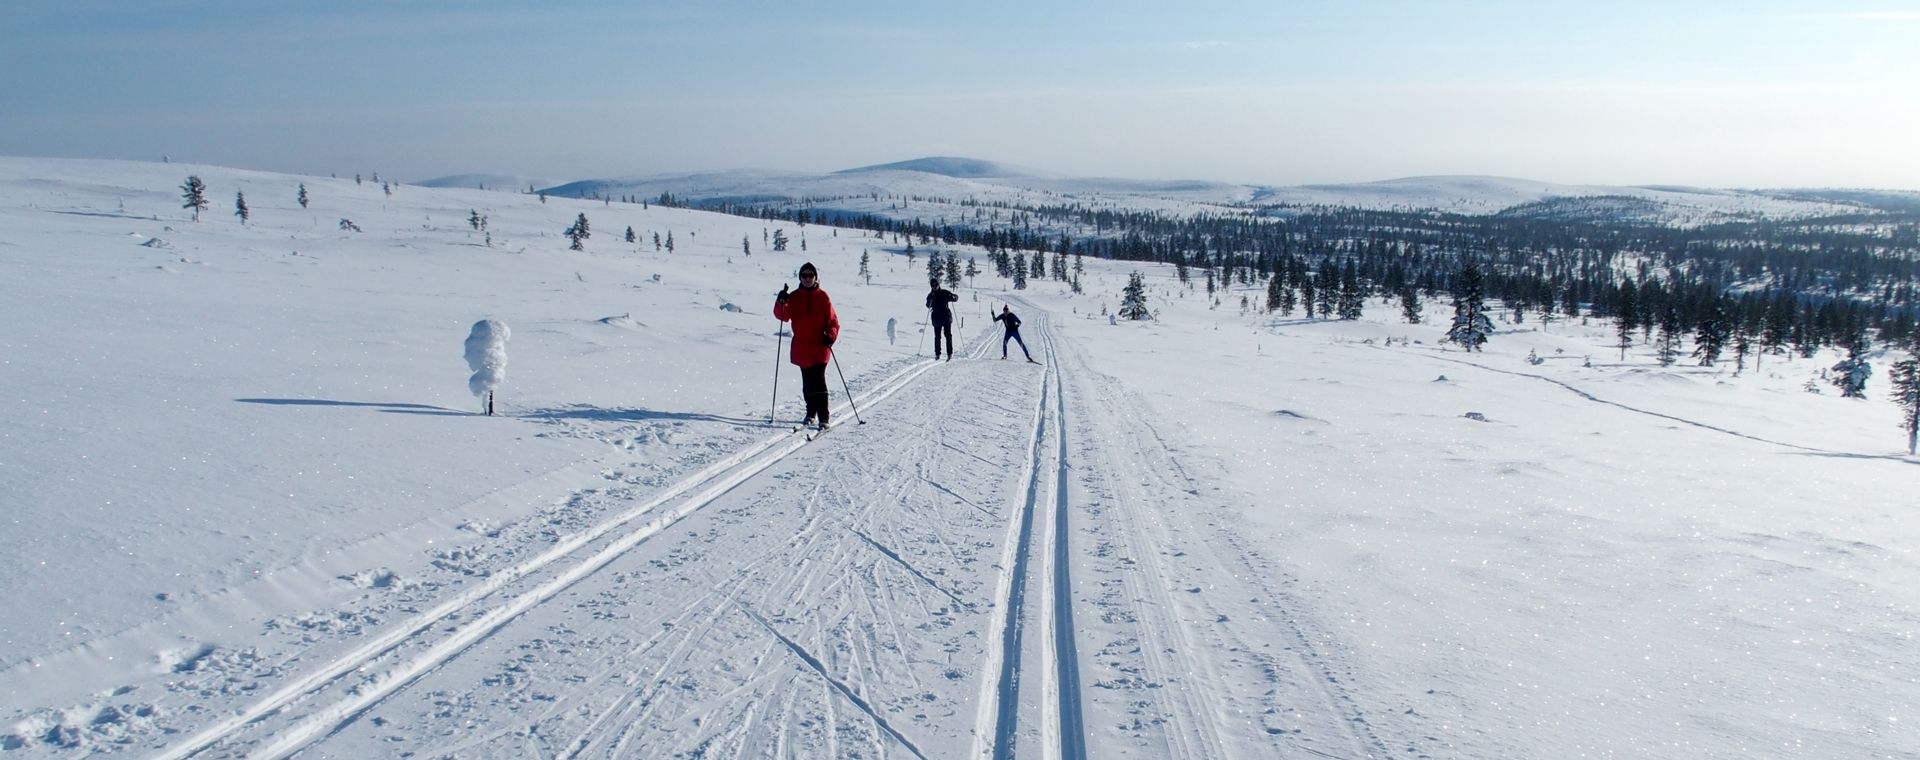 Voyage à la neige Finlande : Laponie finlandaise : Kiilopää